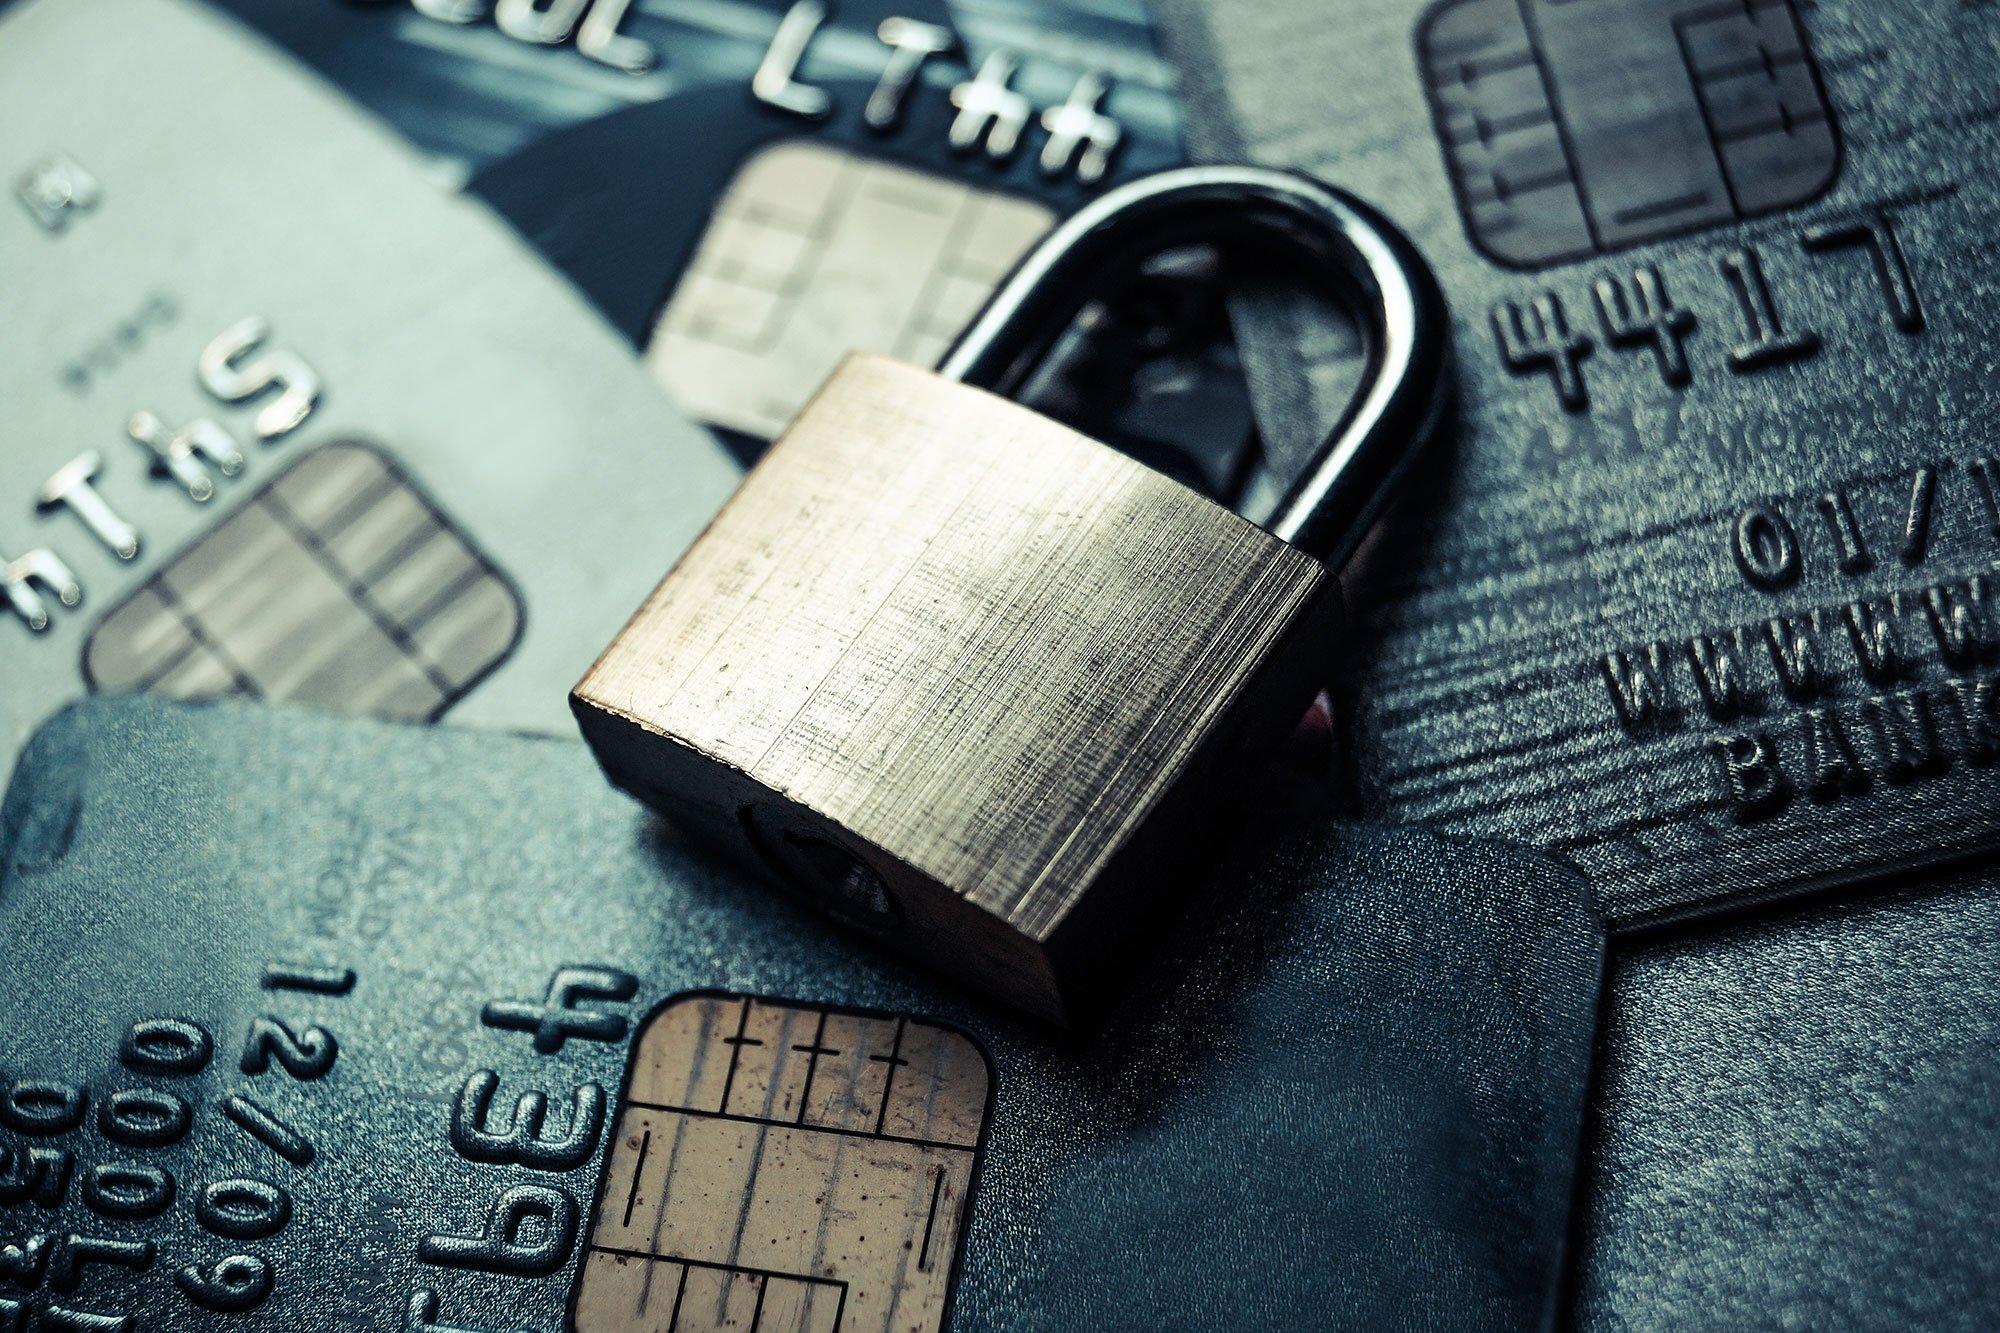 Padlock and credit cards